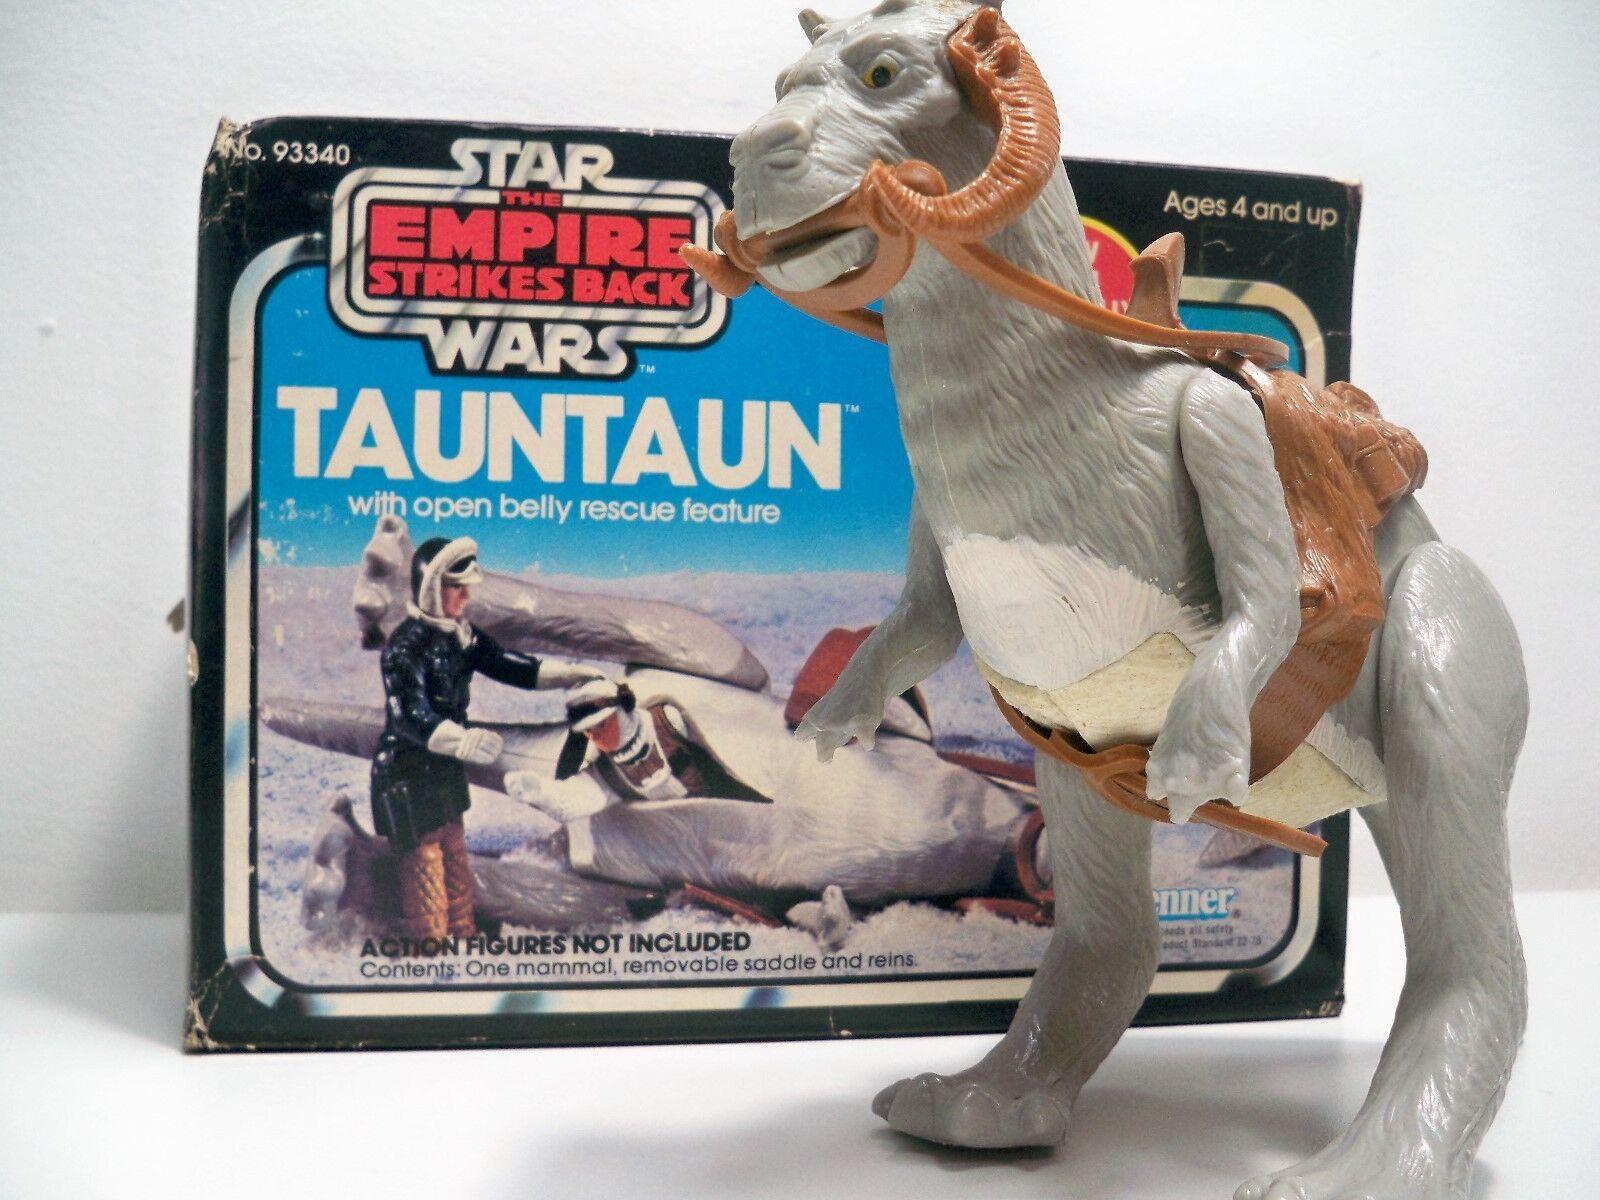 D1799141 TAUN TAUN MINT IN BOX MIB STAR WARS HOTH ESB 1981 LOOSE ACTION FIGURE